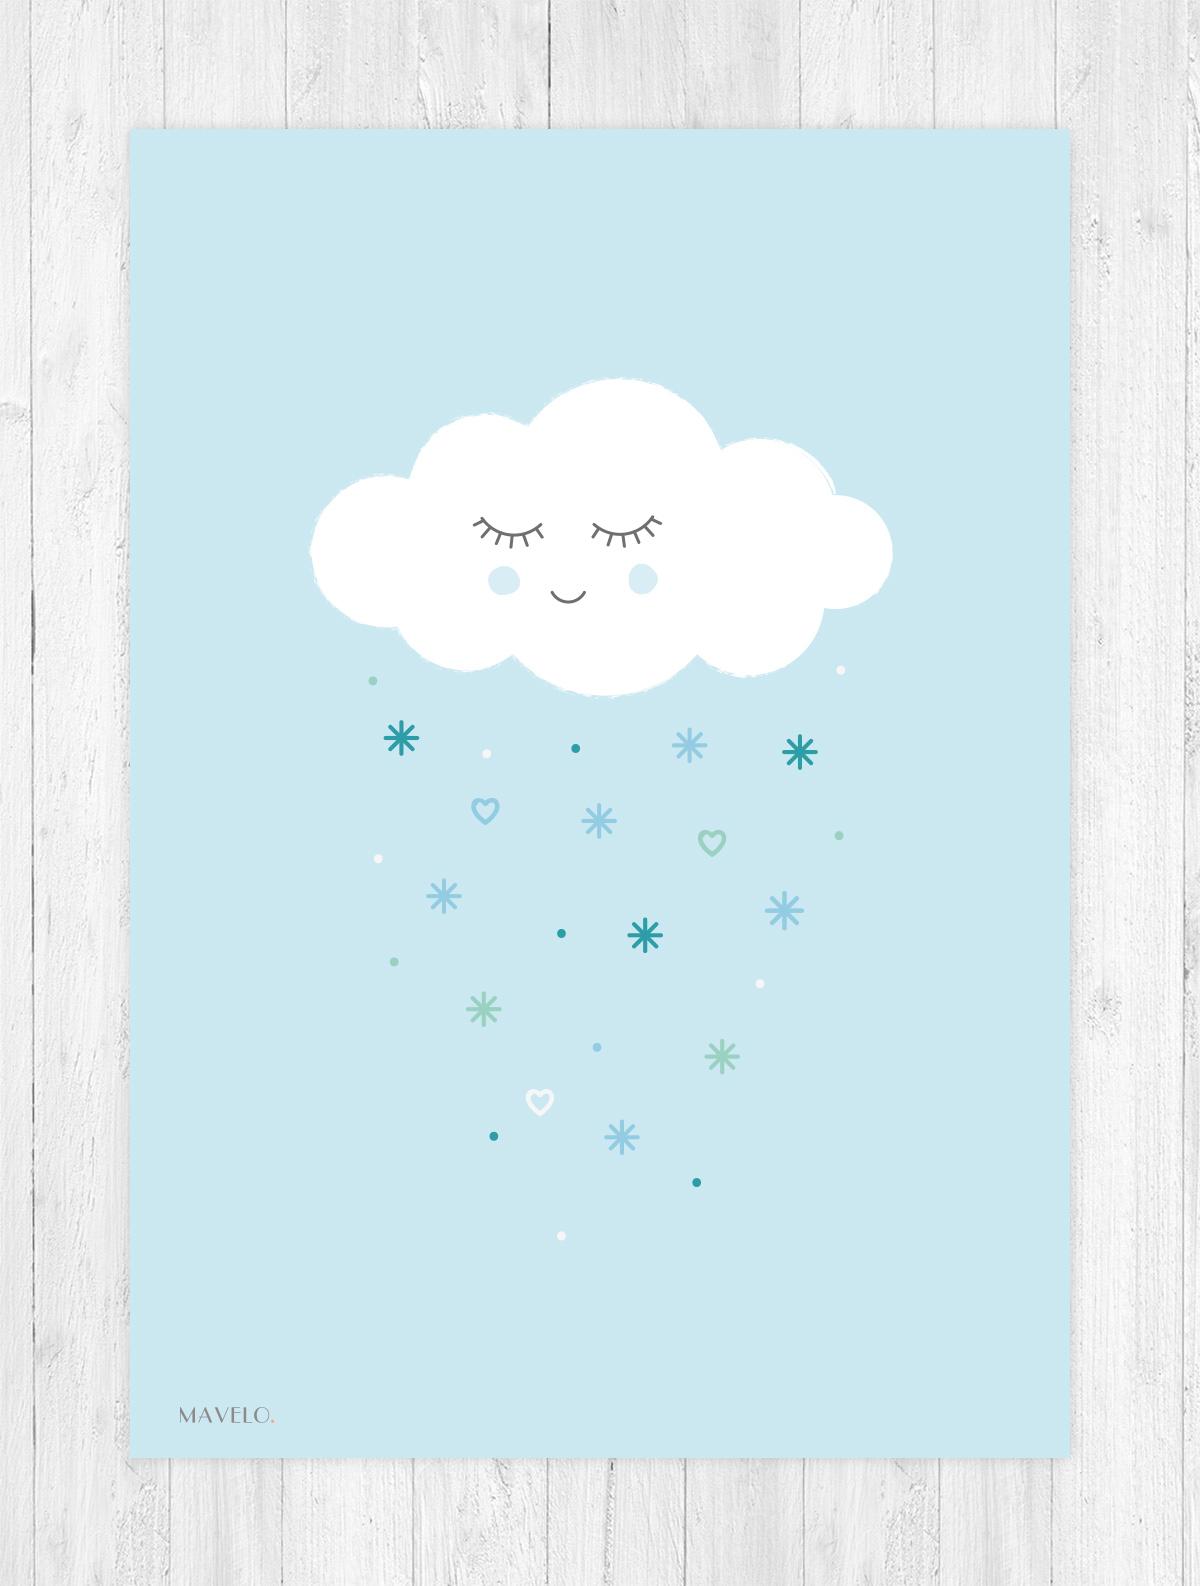 plakat z chmurką do druku / free printables poster